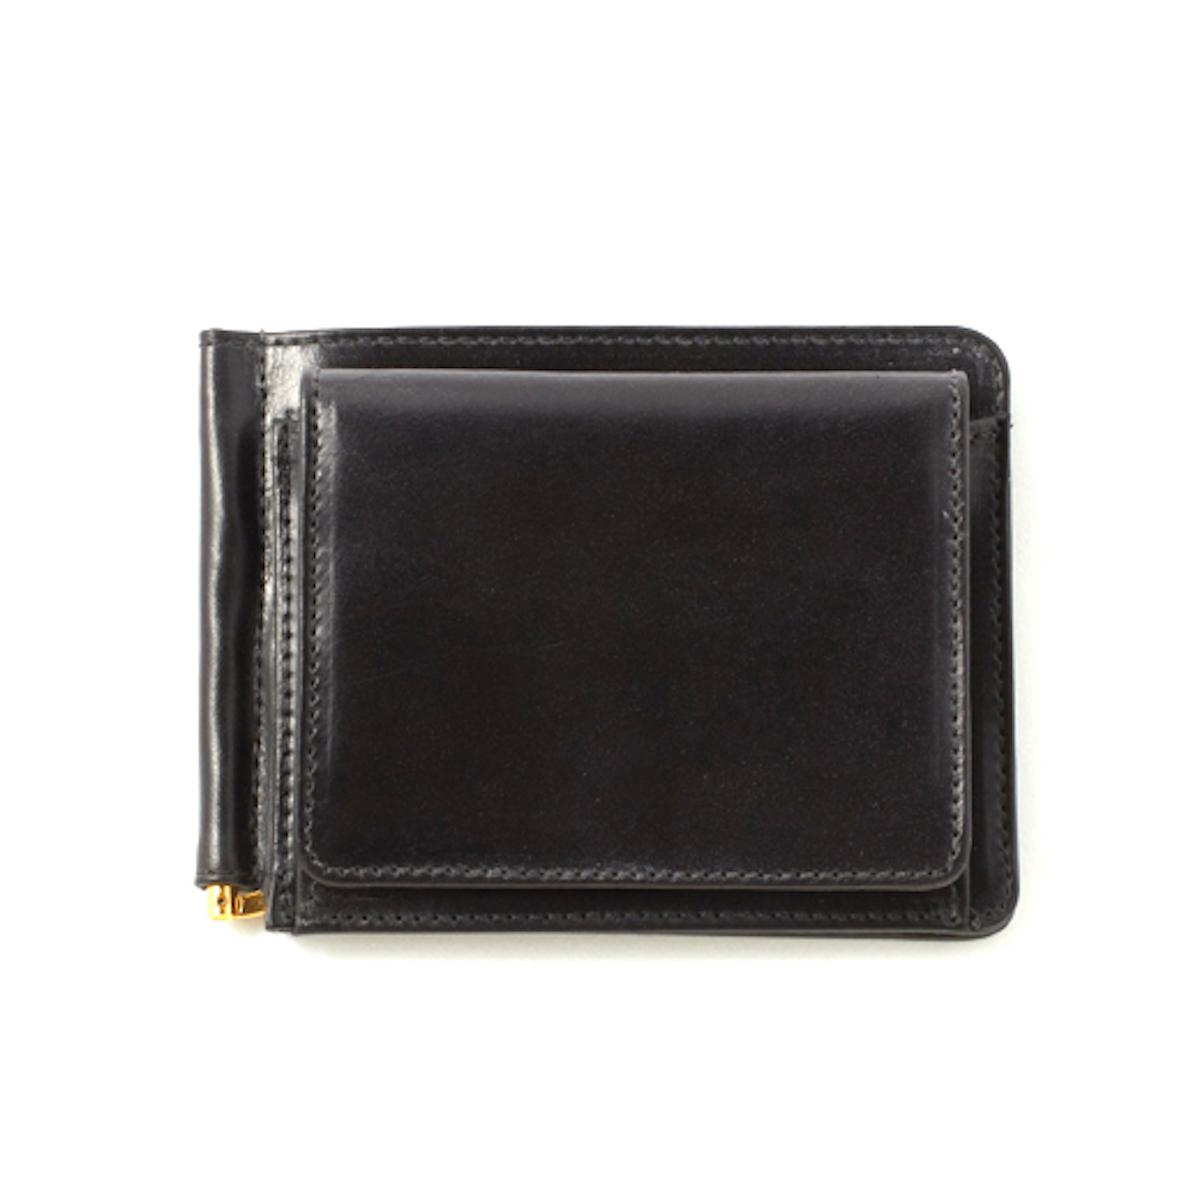 GLENROYAL / MONEY CLIP WITH COIN POCKET -NEW BLACK